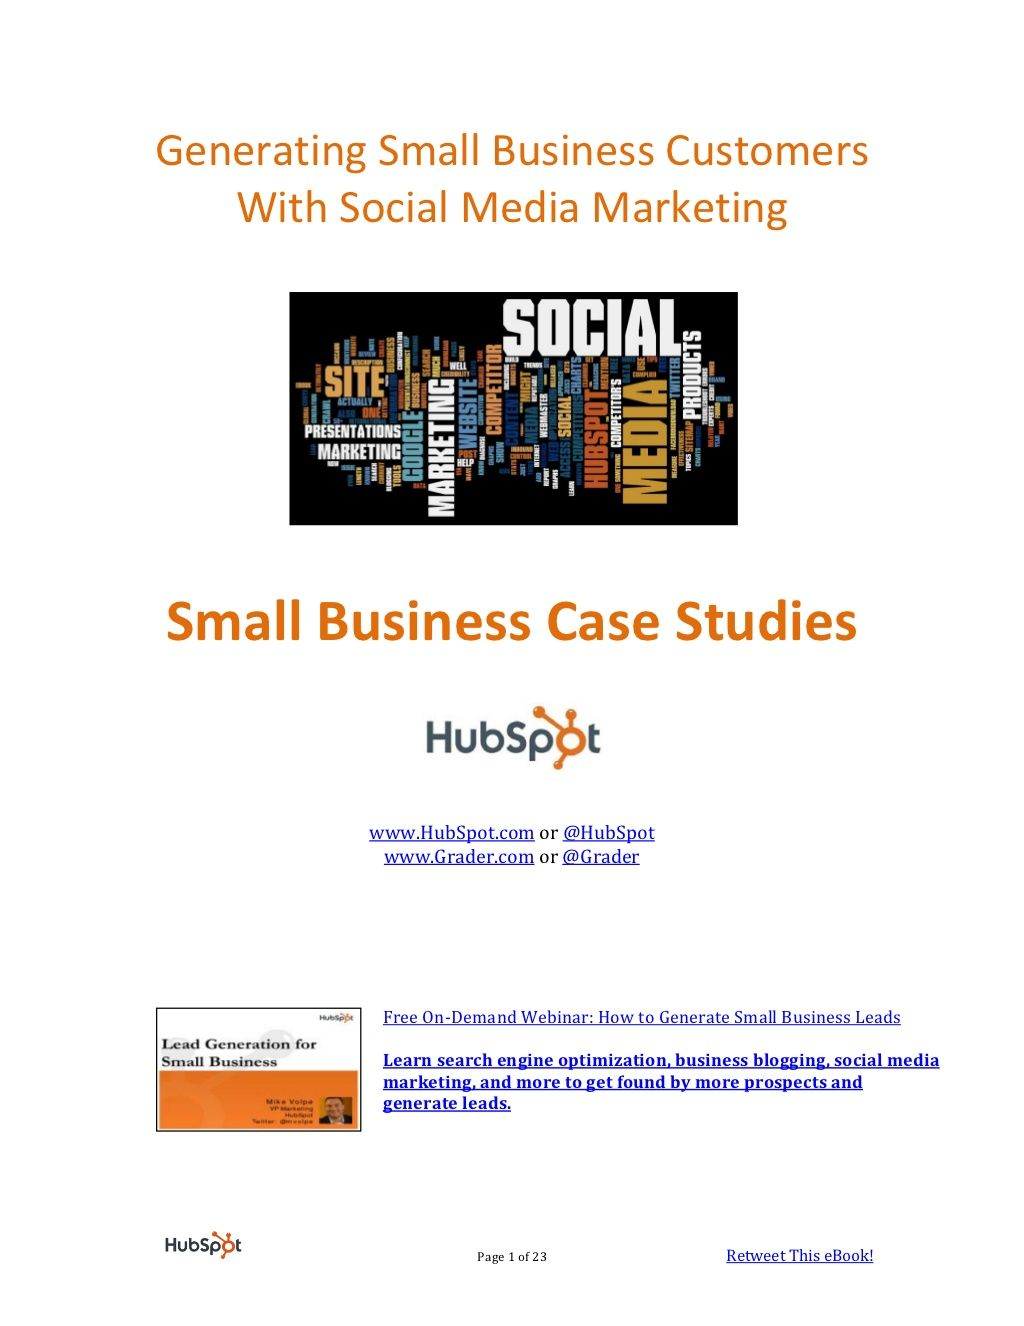 smallbusinesssocialmediaebookhubspot by HubSpot All